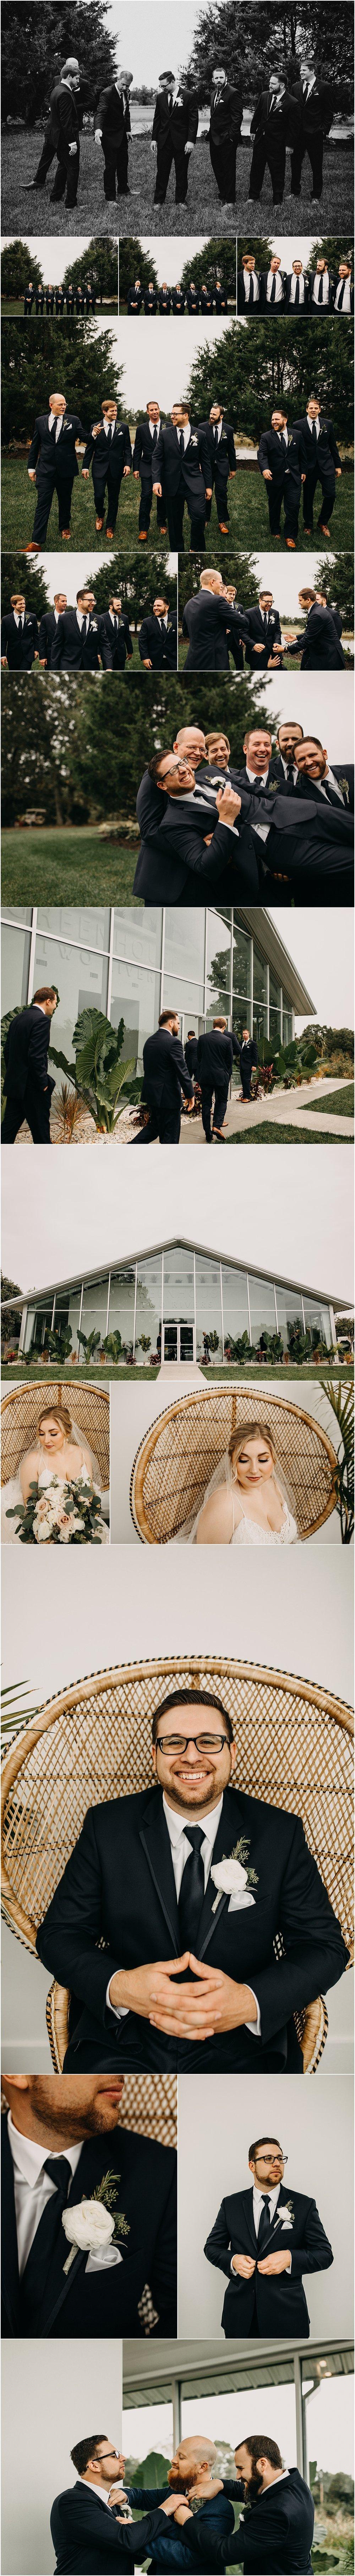 springfield missouri wedding venue